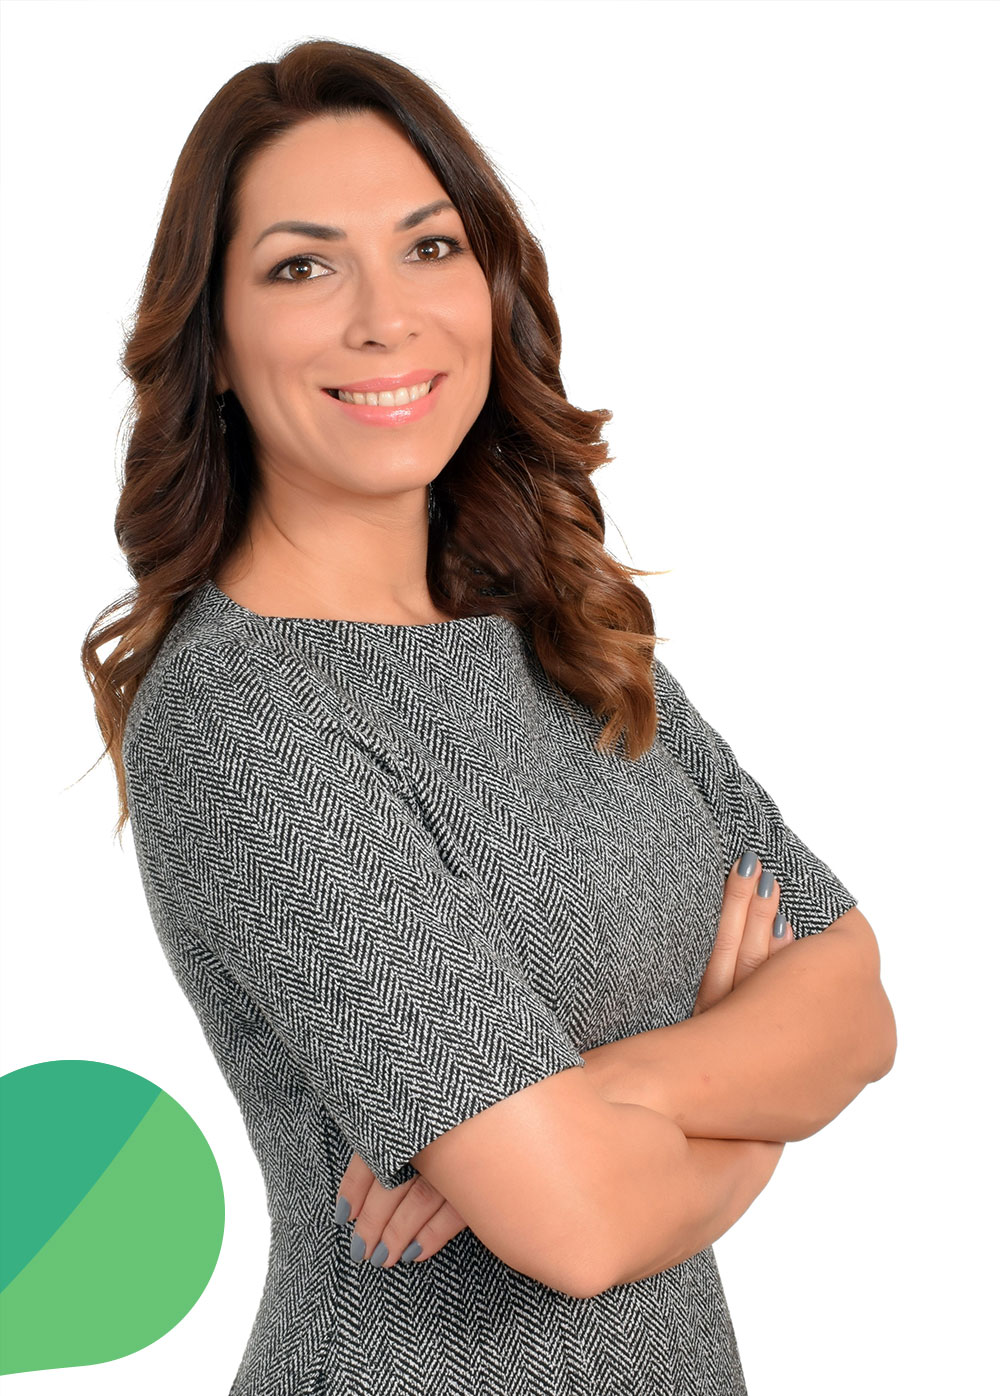 Jelena Babic-Vogas